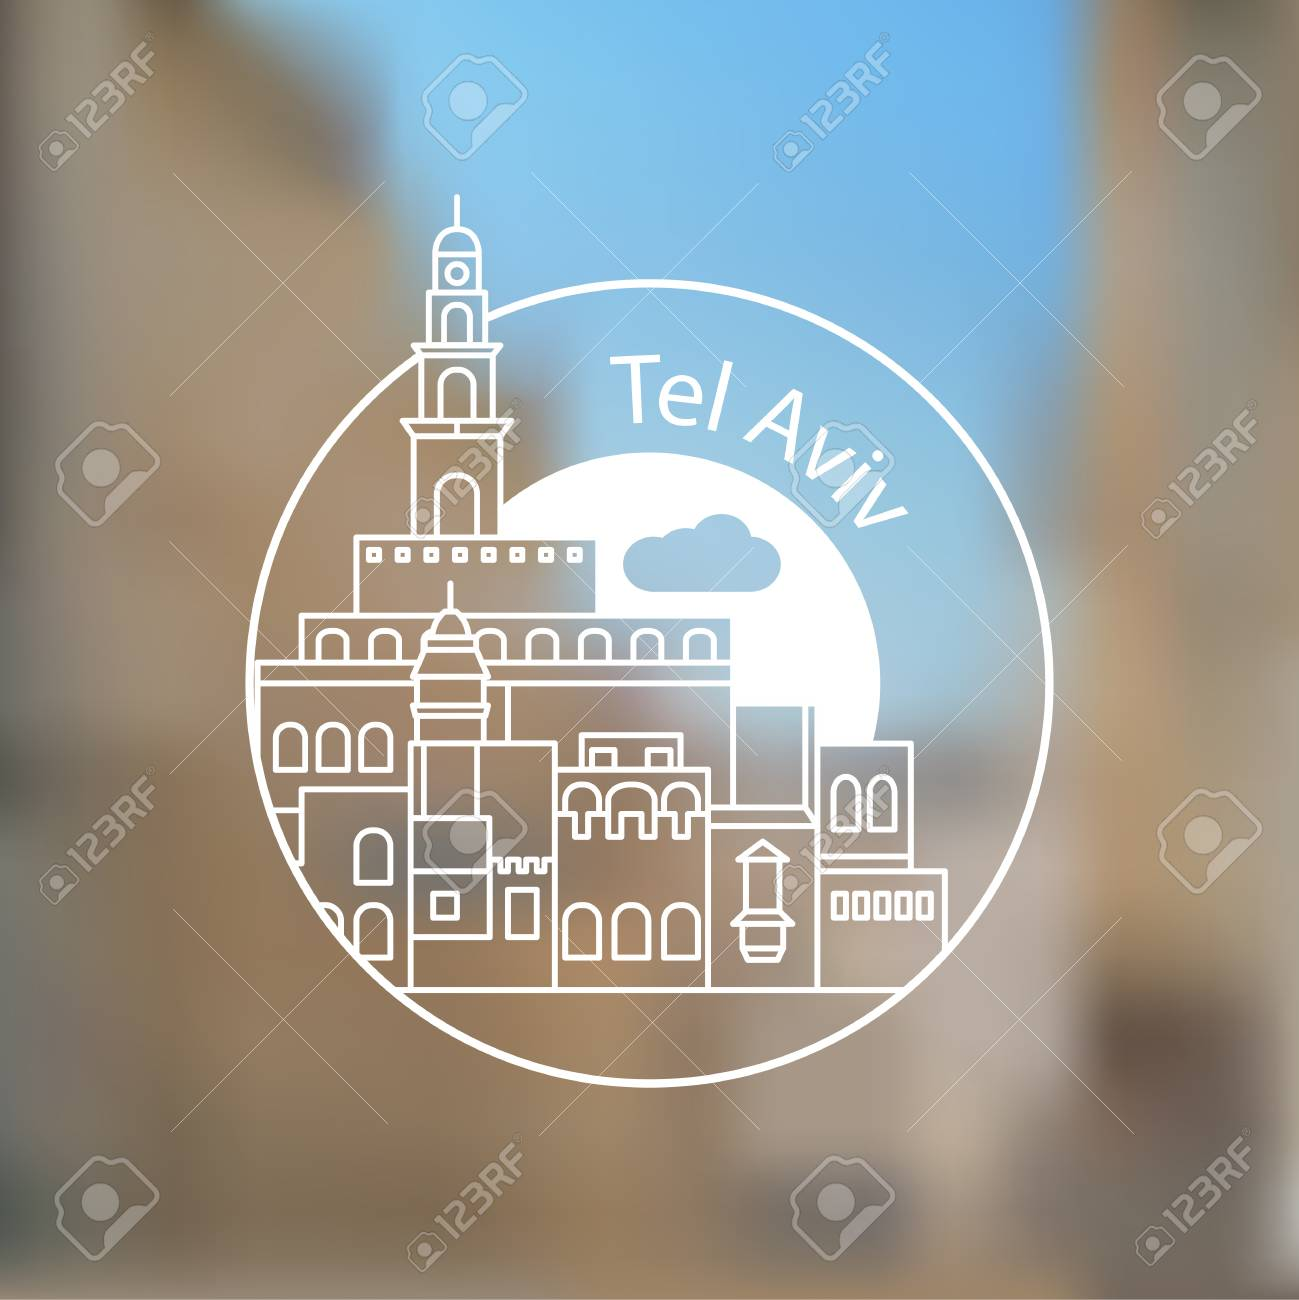 Jaffa Portr - The symbol of Tel Aviv, Israel. - 106118003